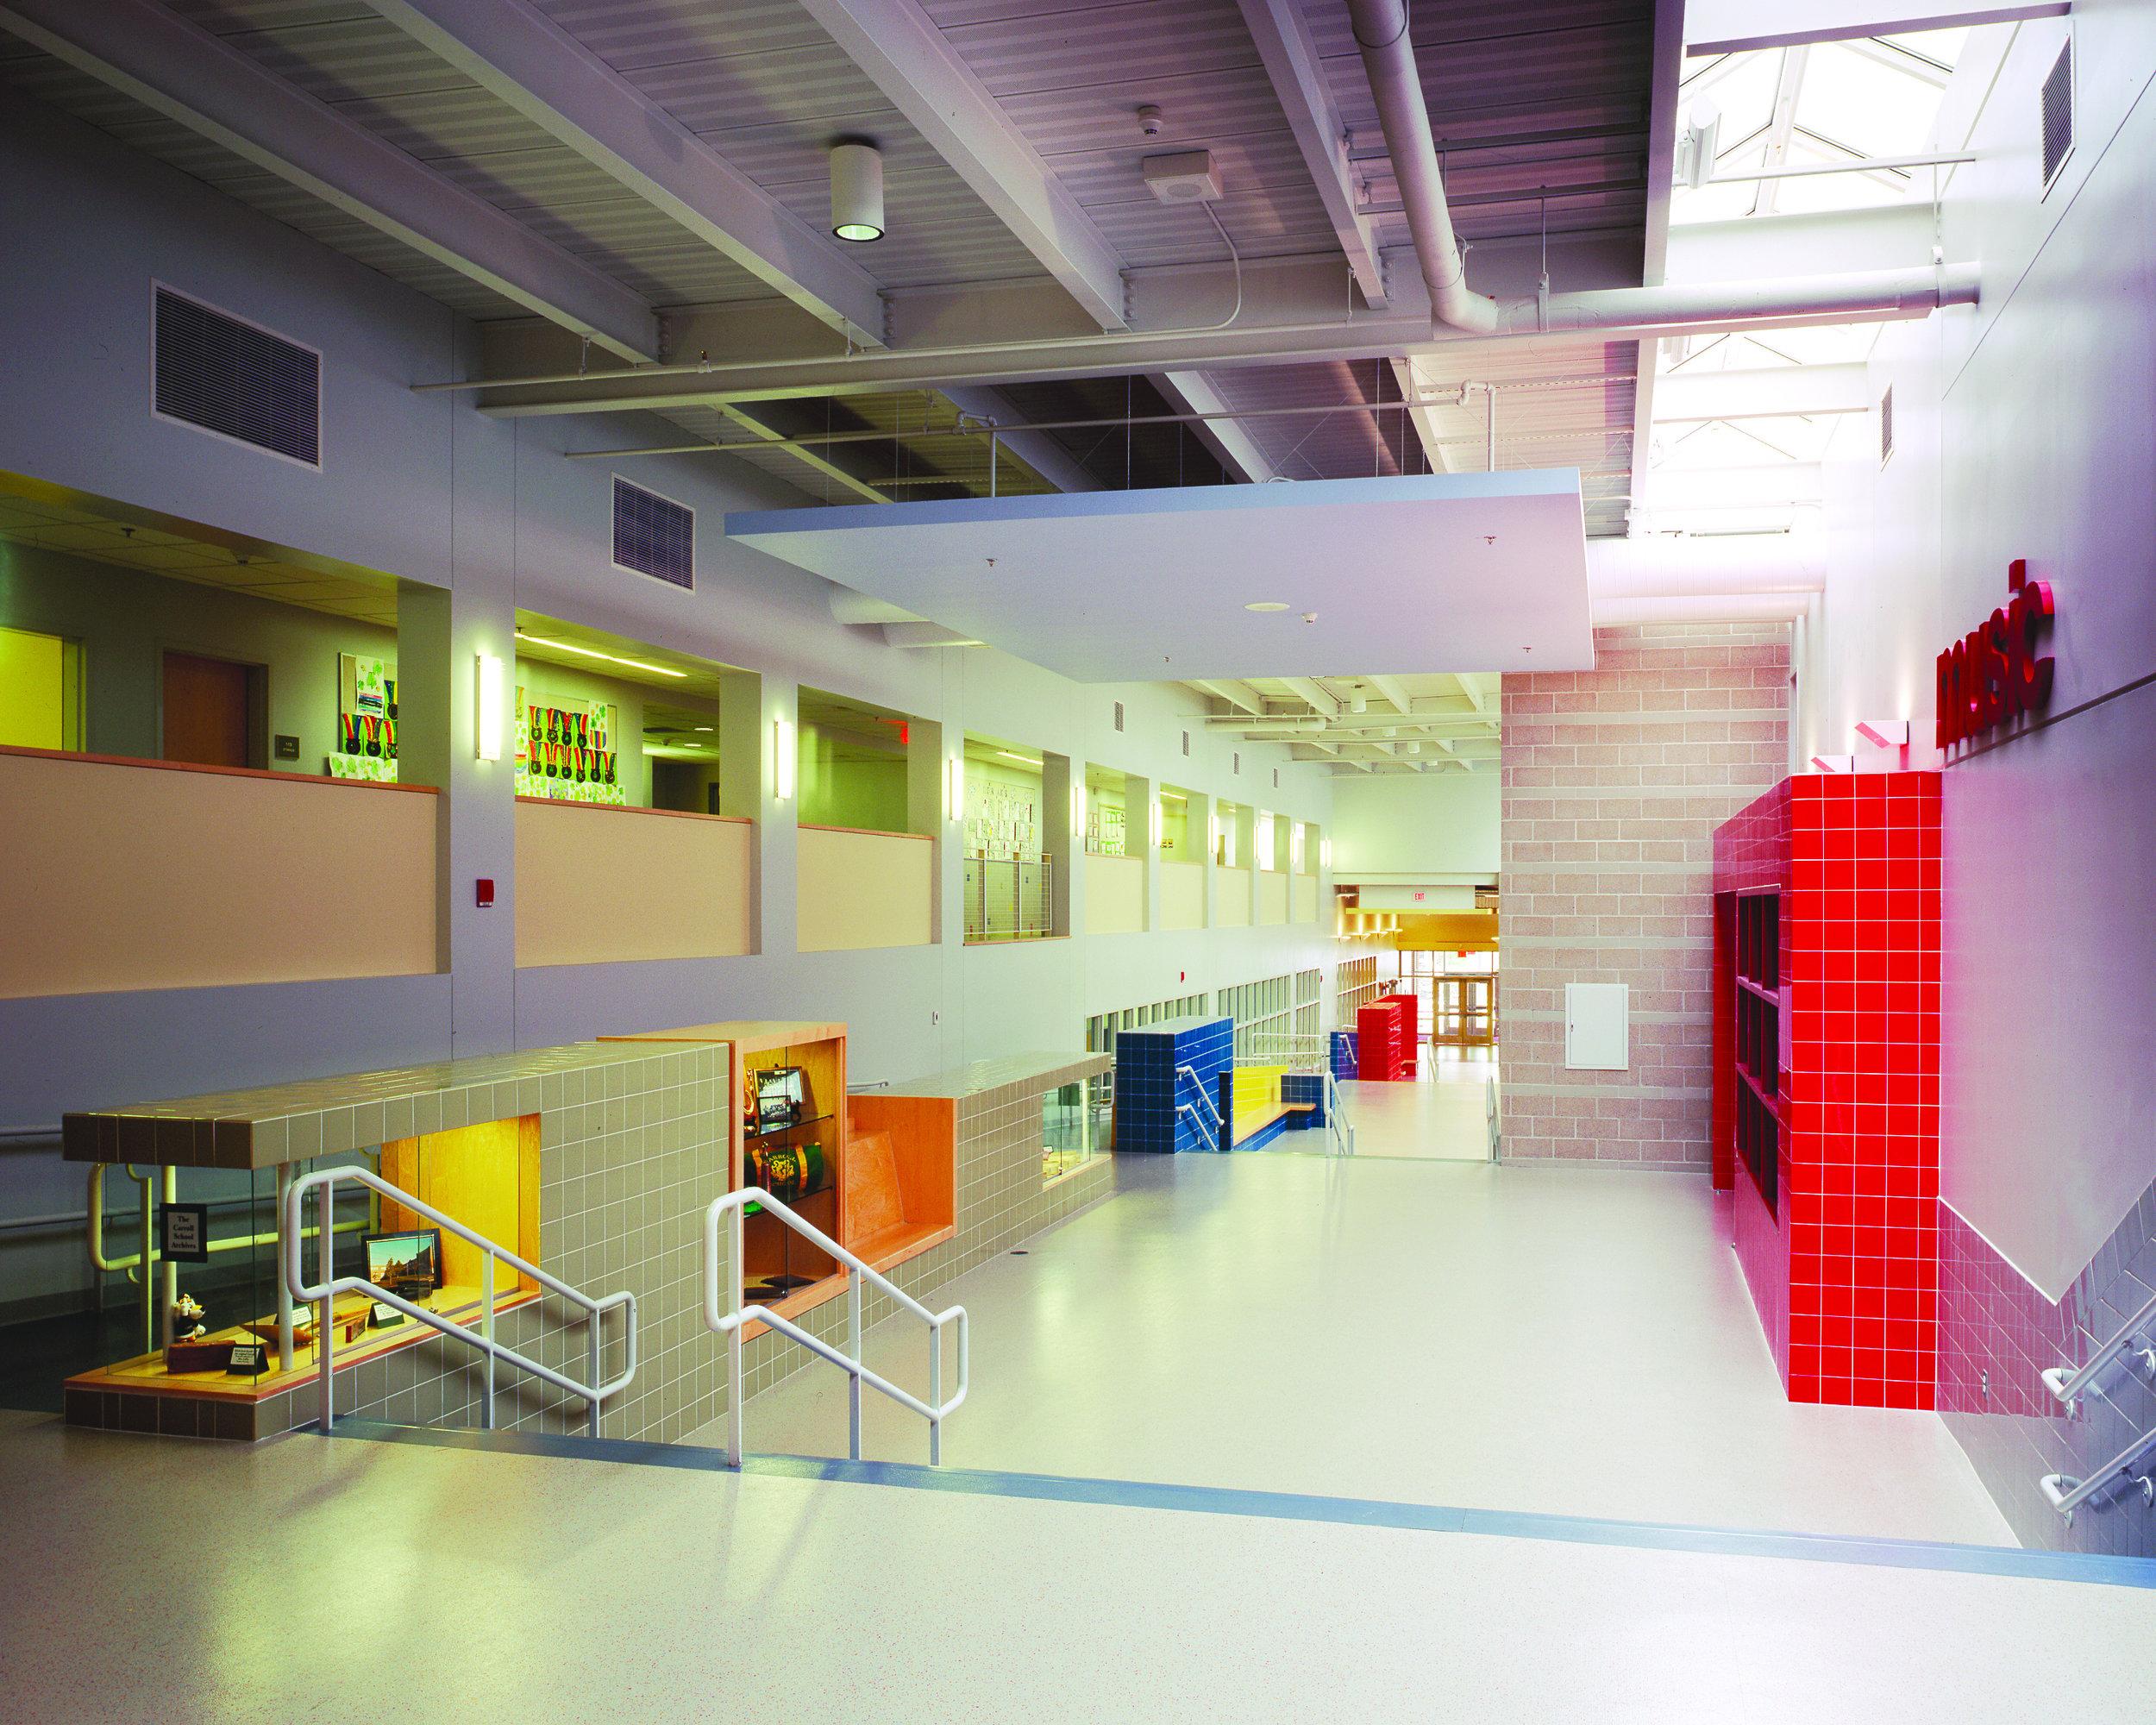 Carroll Elementary School